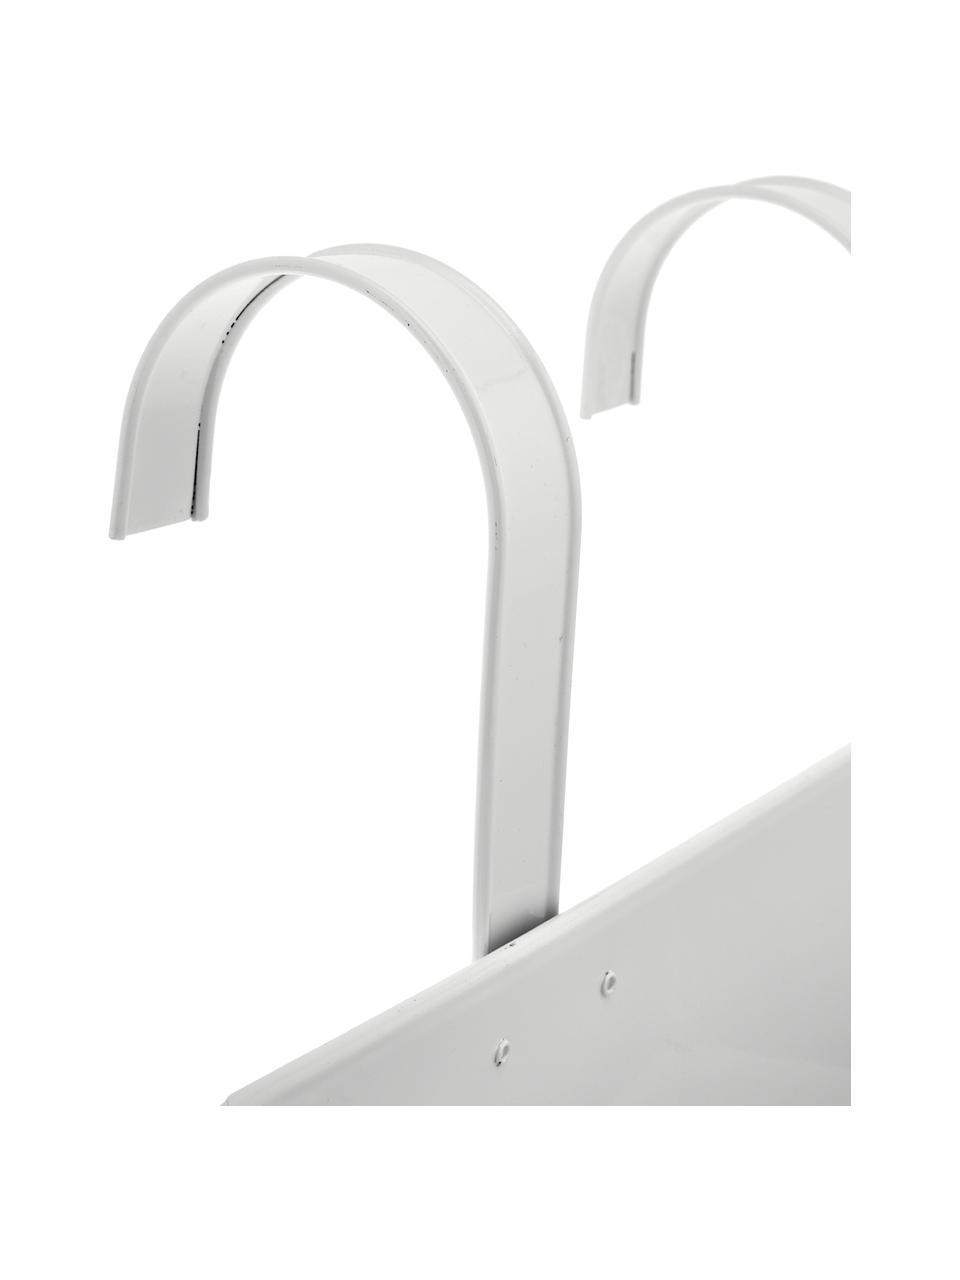 XL Balkon-Übertopf Larissa aus Metall, Metall, beschichtet, Weiß, 40 x 28 cm